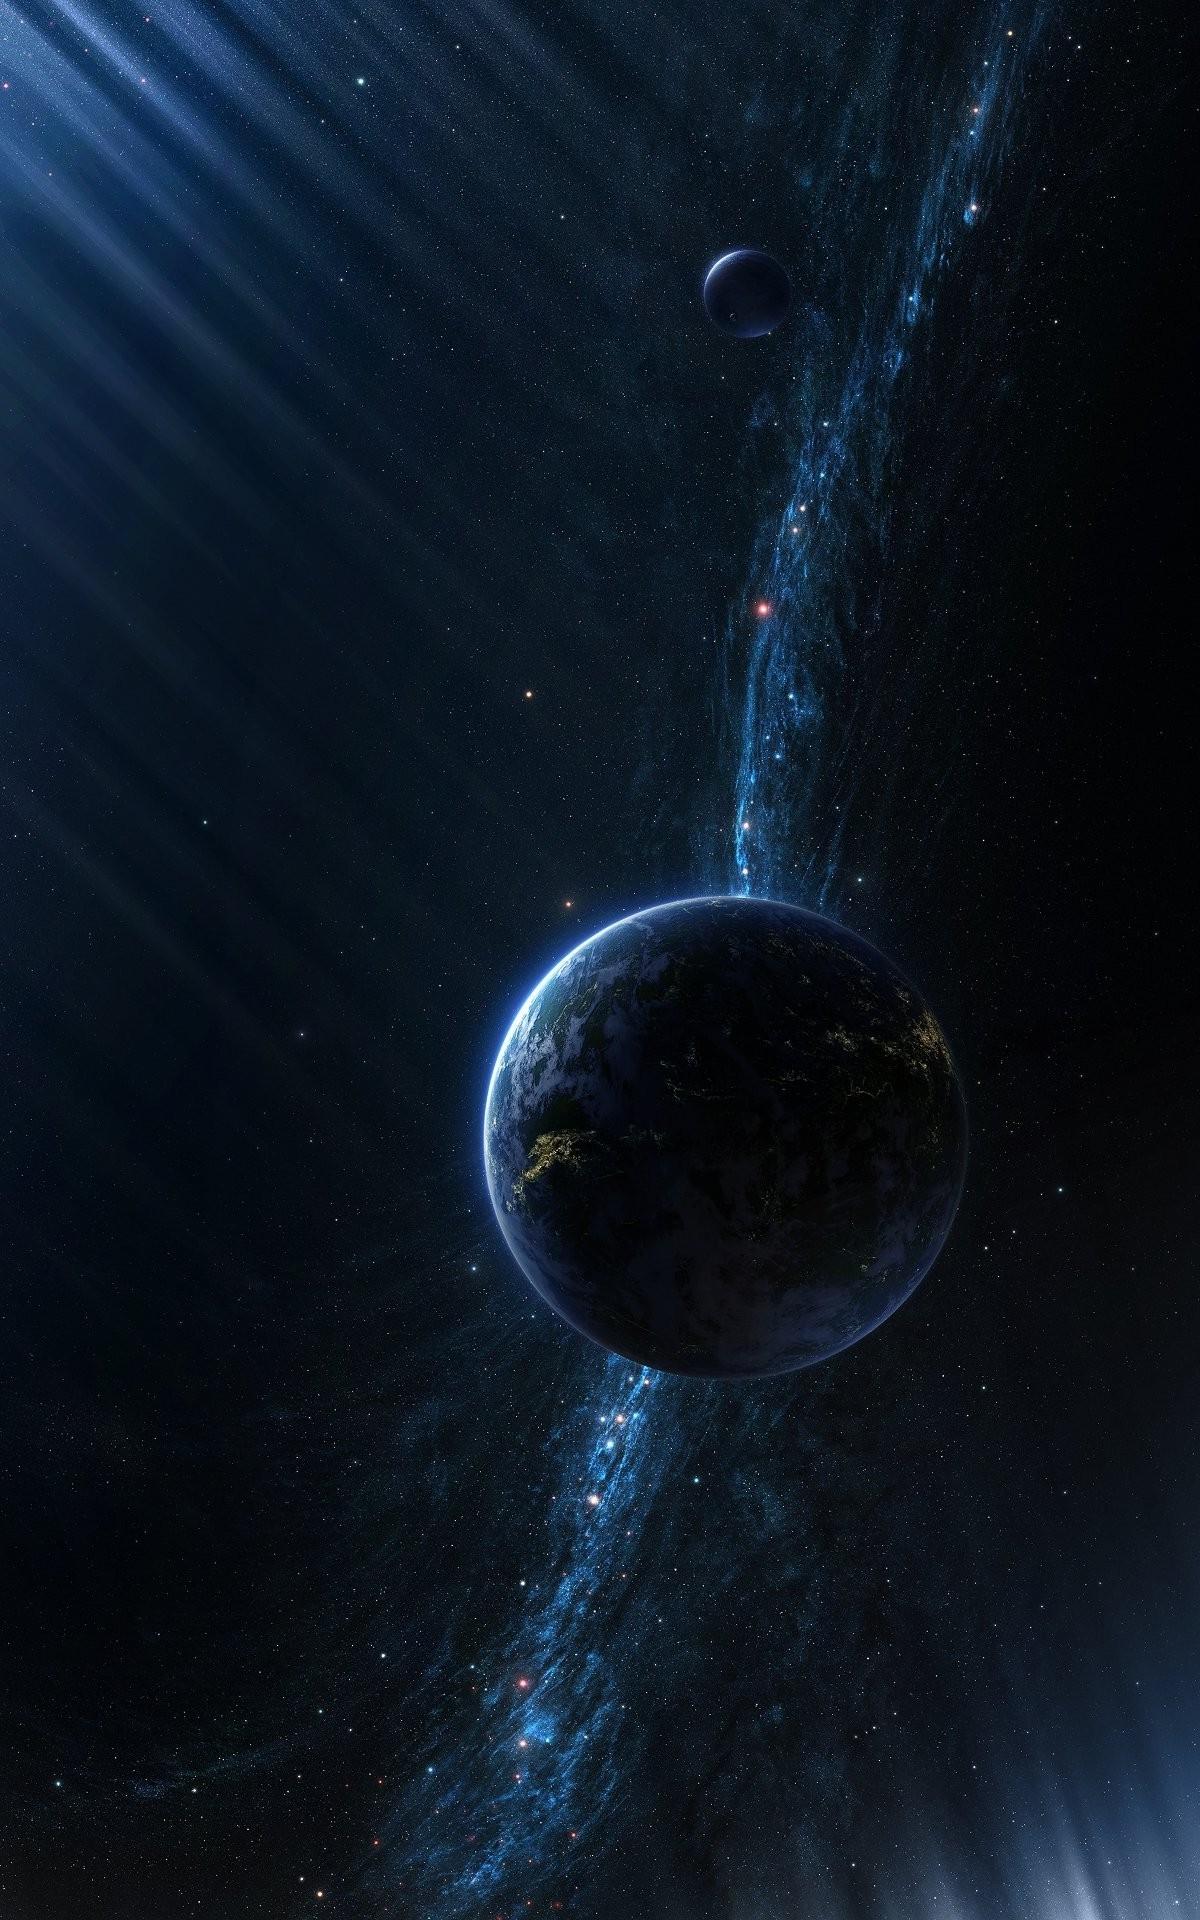 1200x1920 px CGI digital art galaxy Milky Way planet portrait display space stars sun rays universe